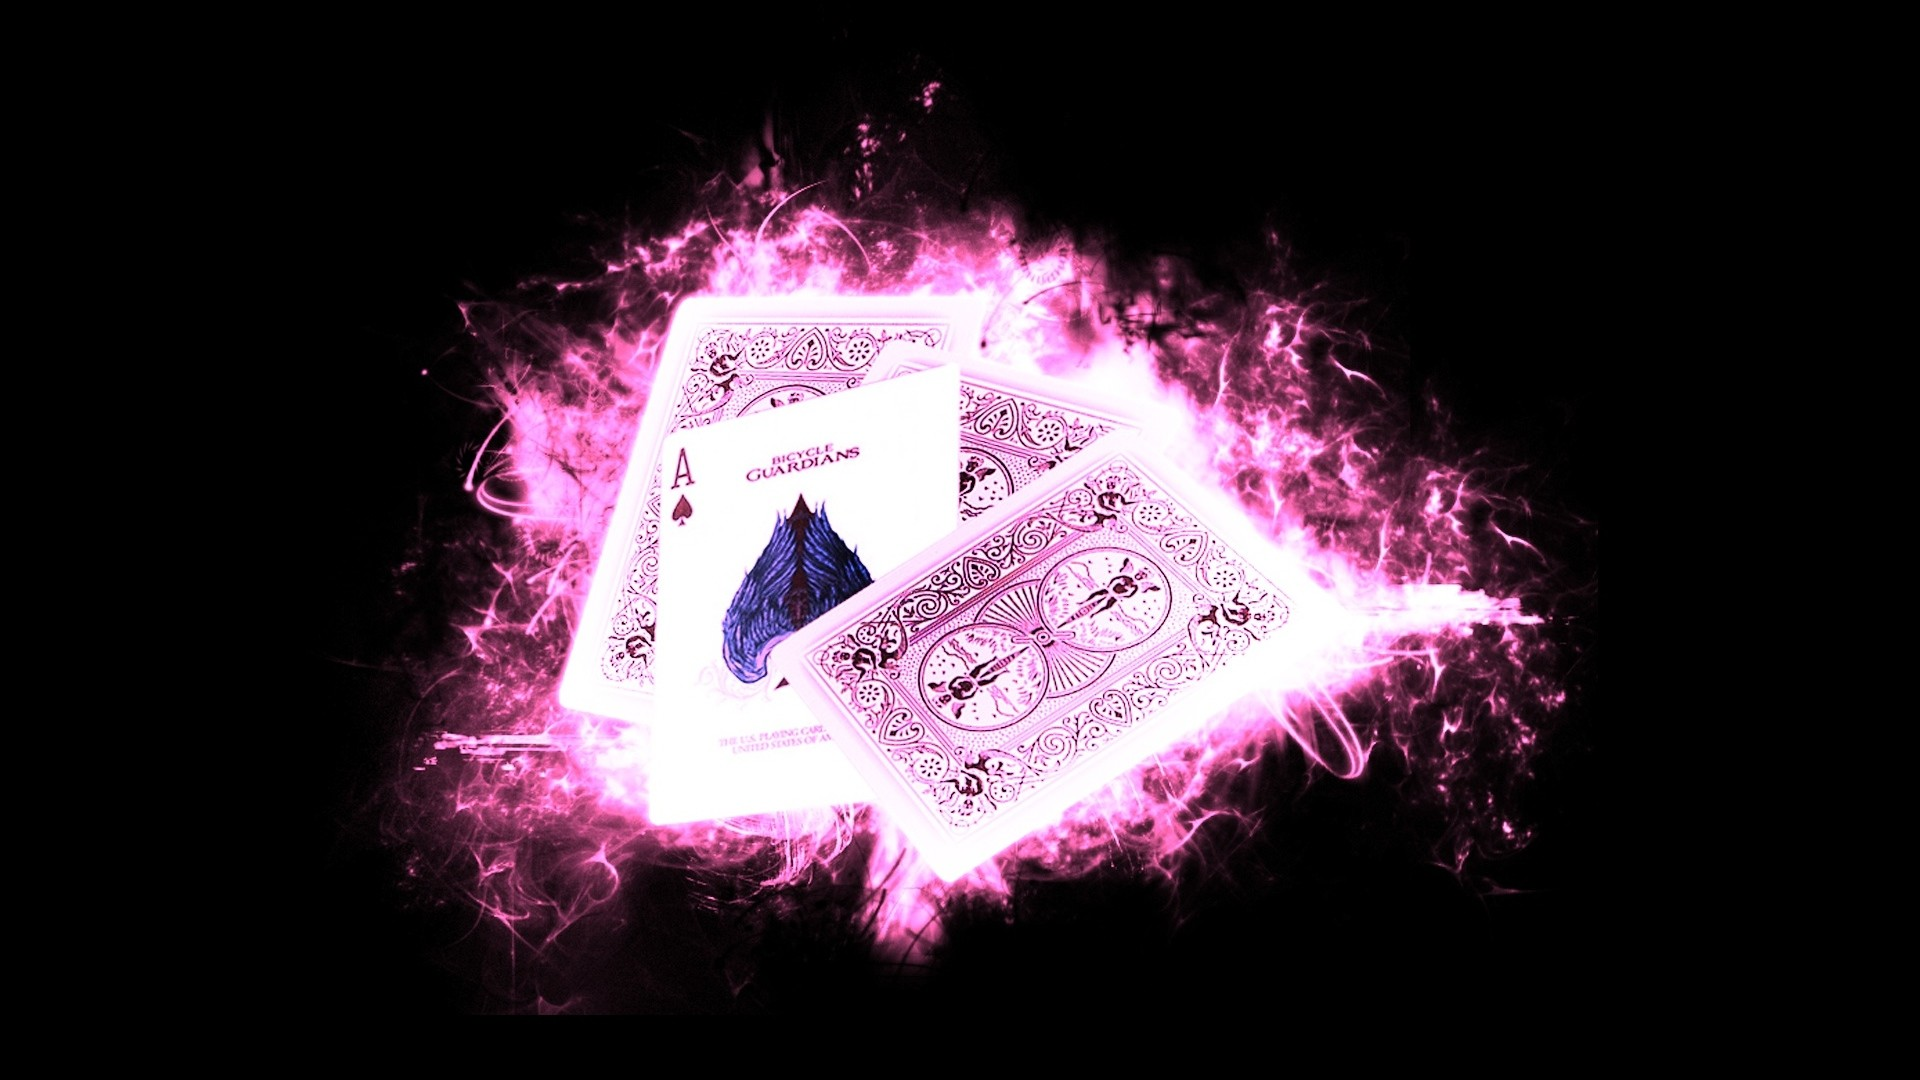 Gambit Guardians Wallpaper Gambit, Guardians, Hd